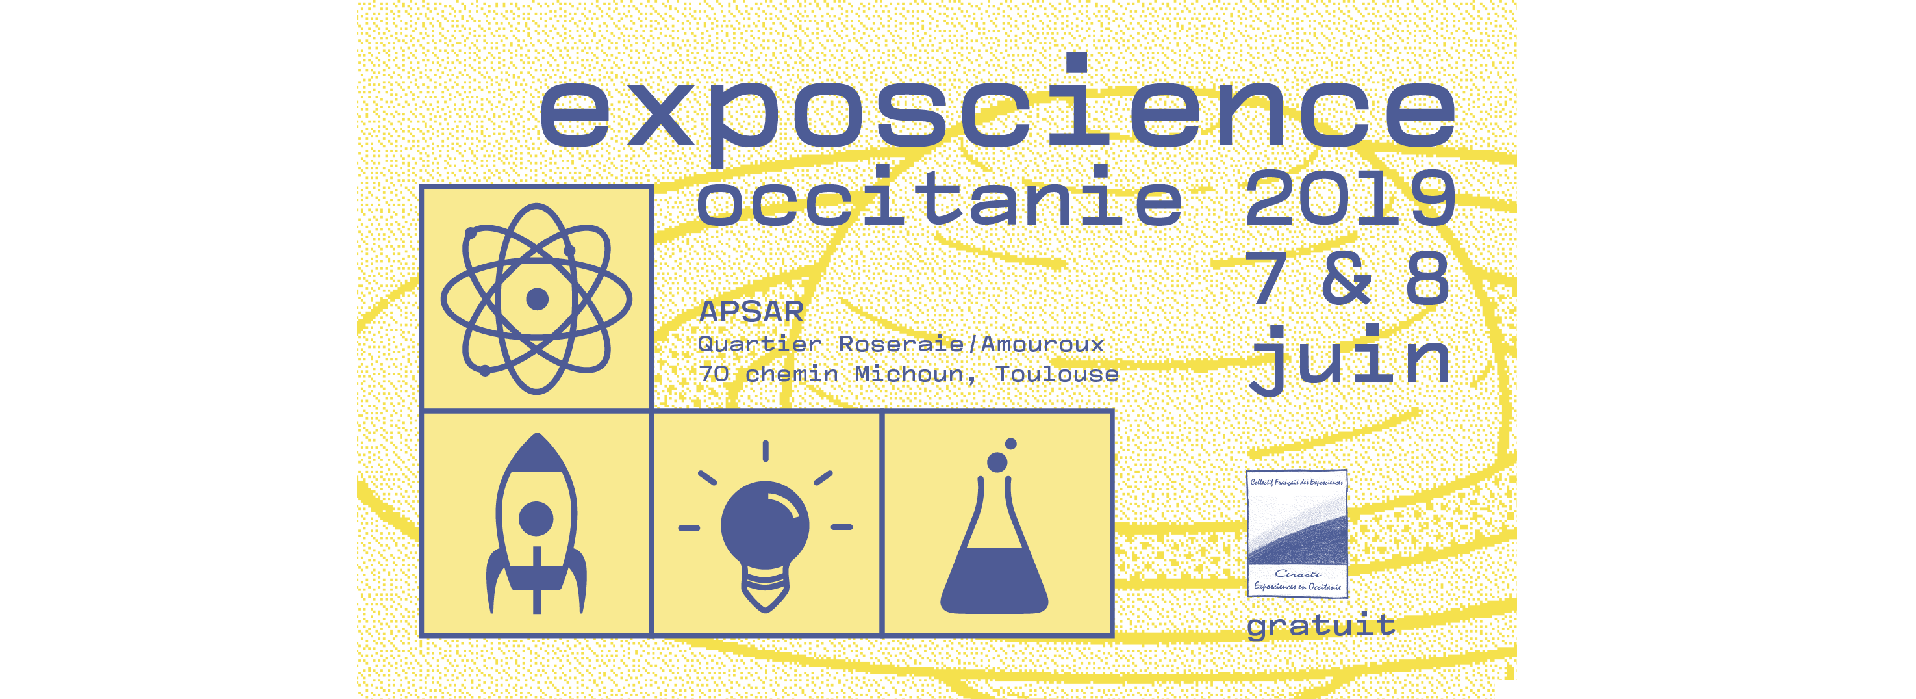 Exposcience Occitanie 2019